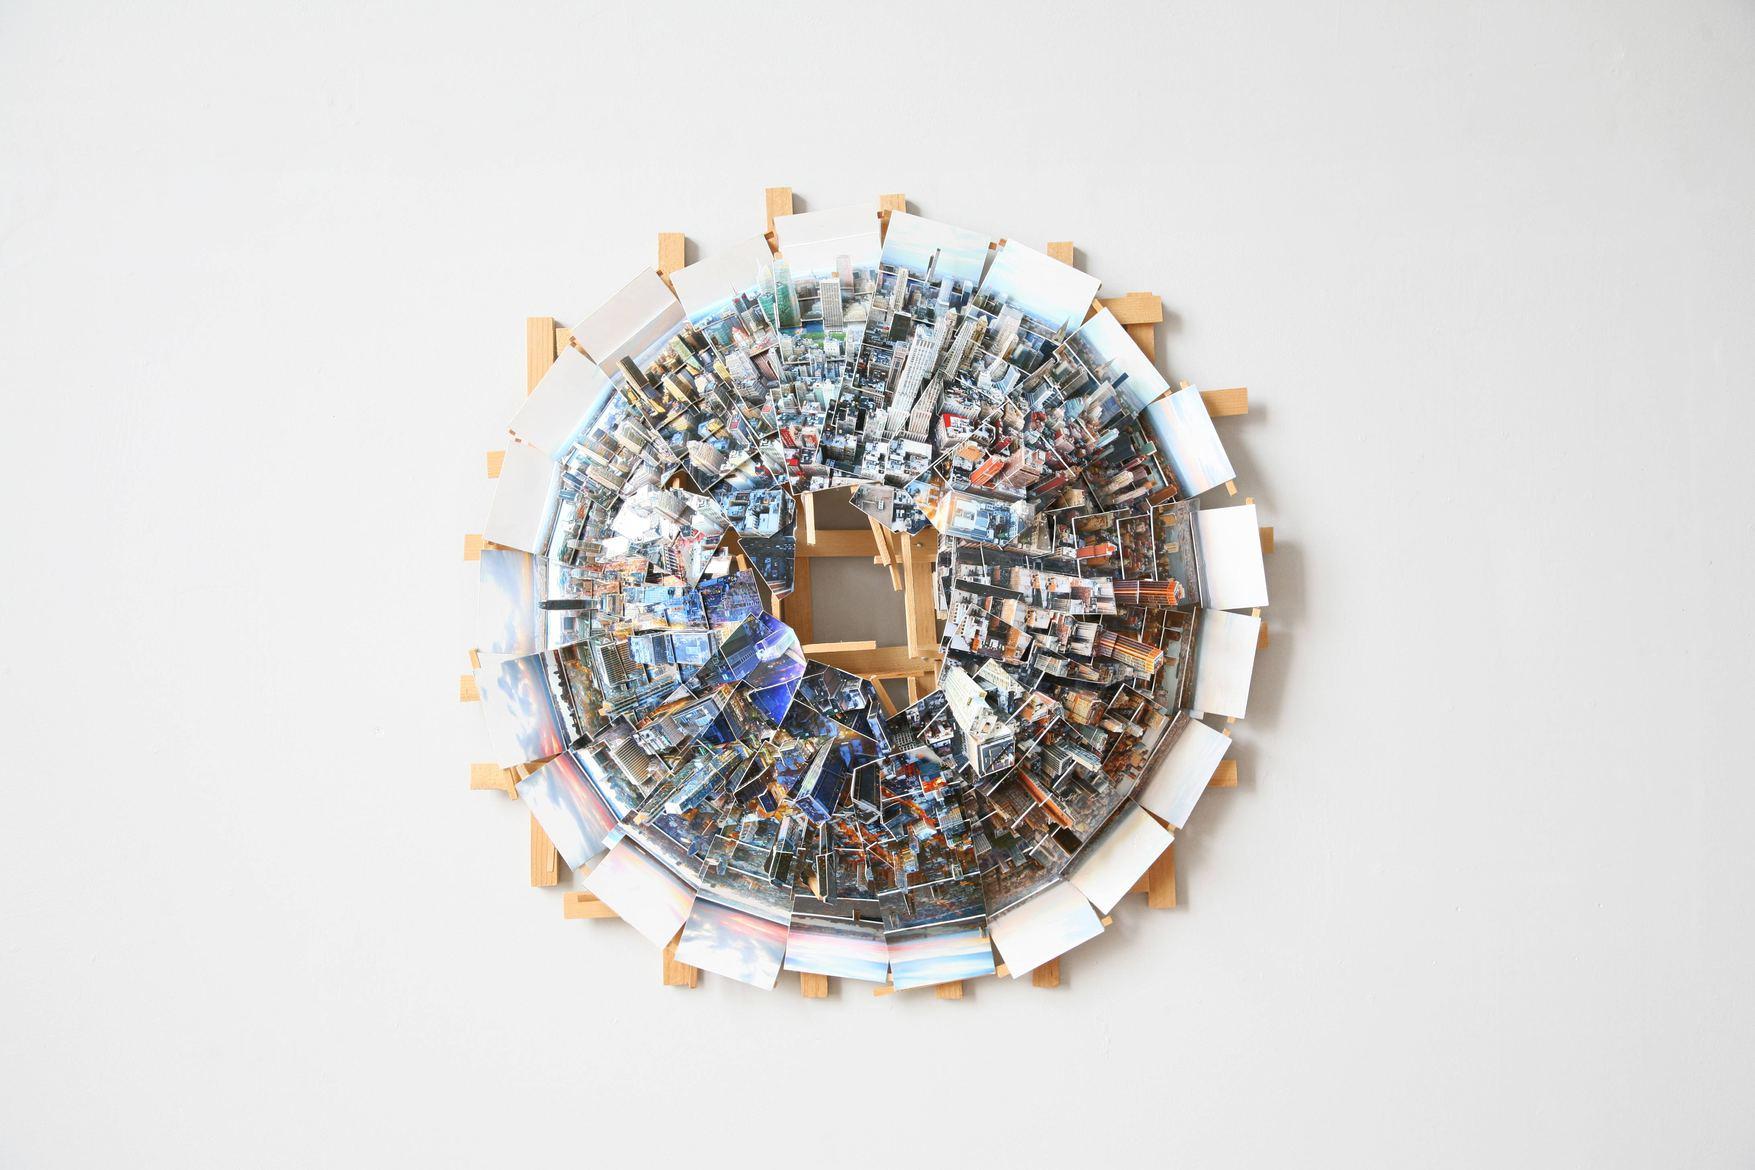 'New York Planet', 2017, C-print, wood, museum board, 60 x 60 x 20 cm